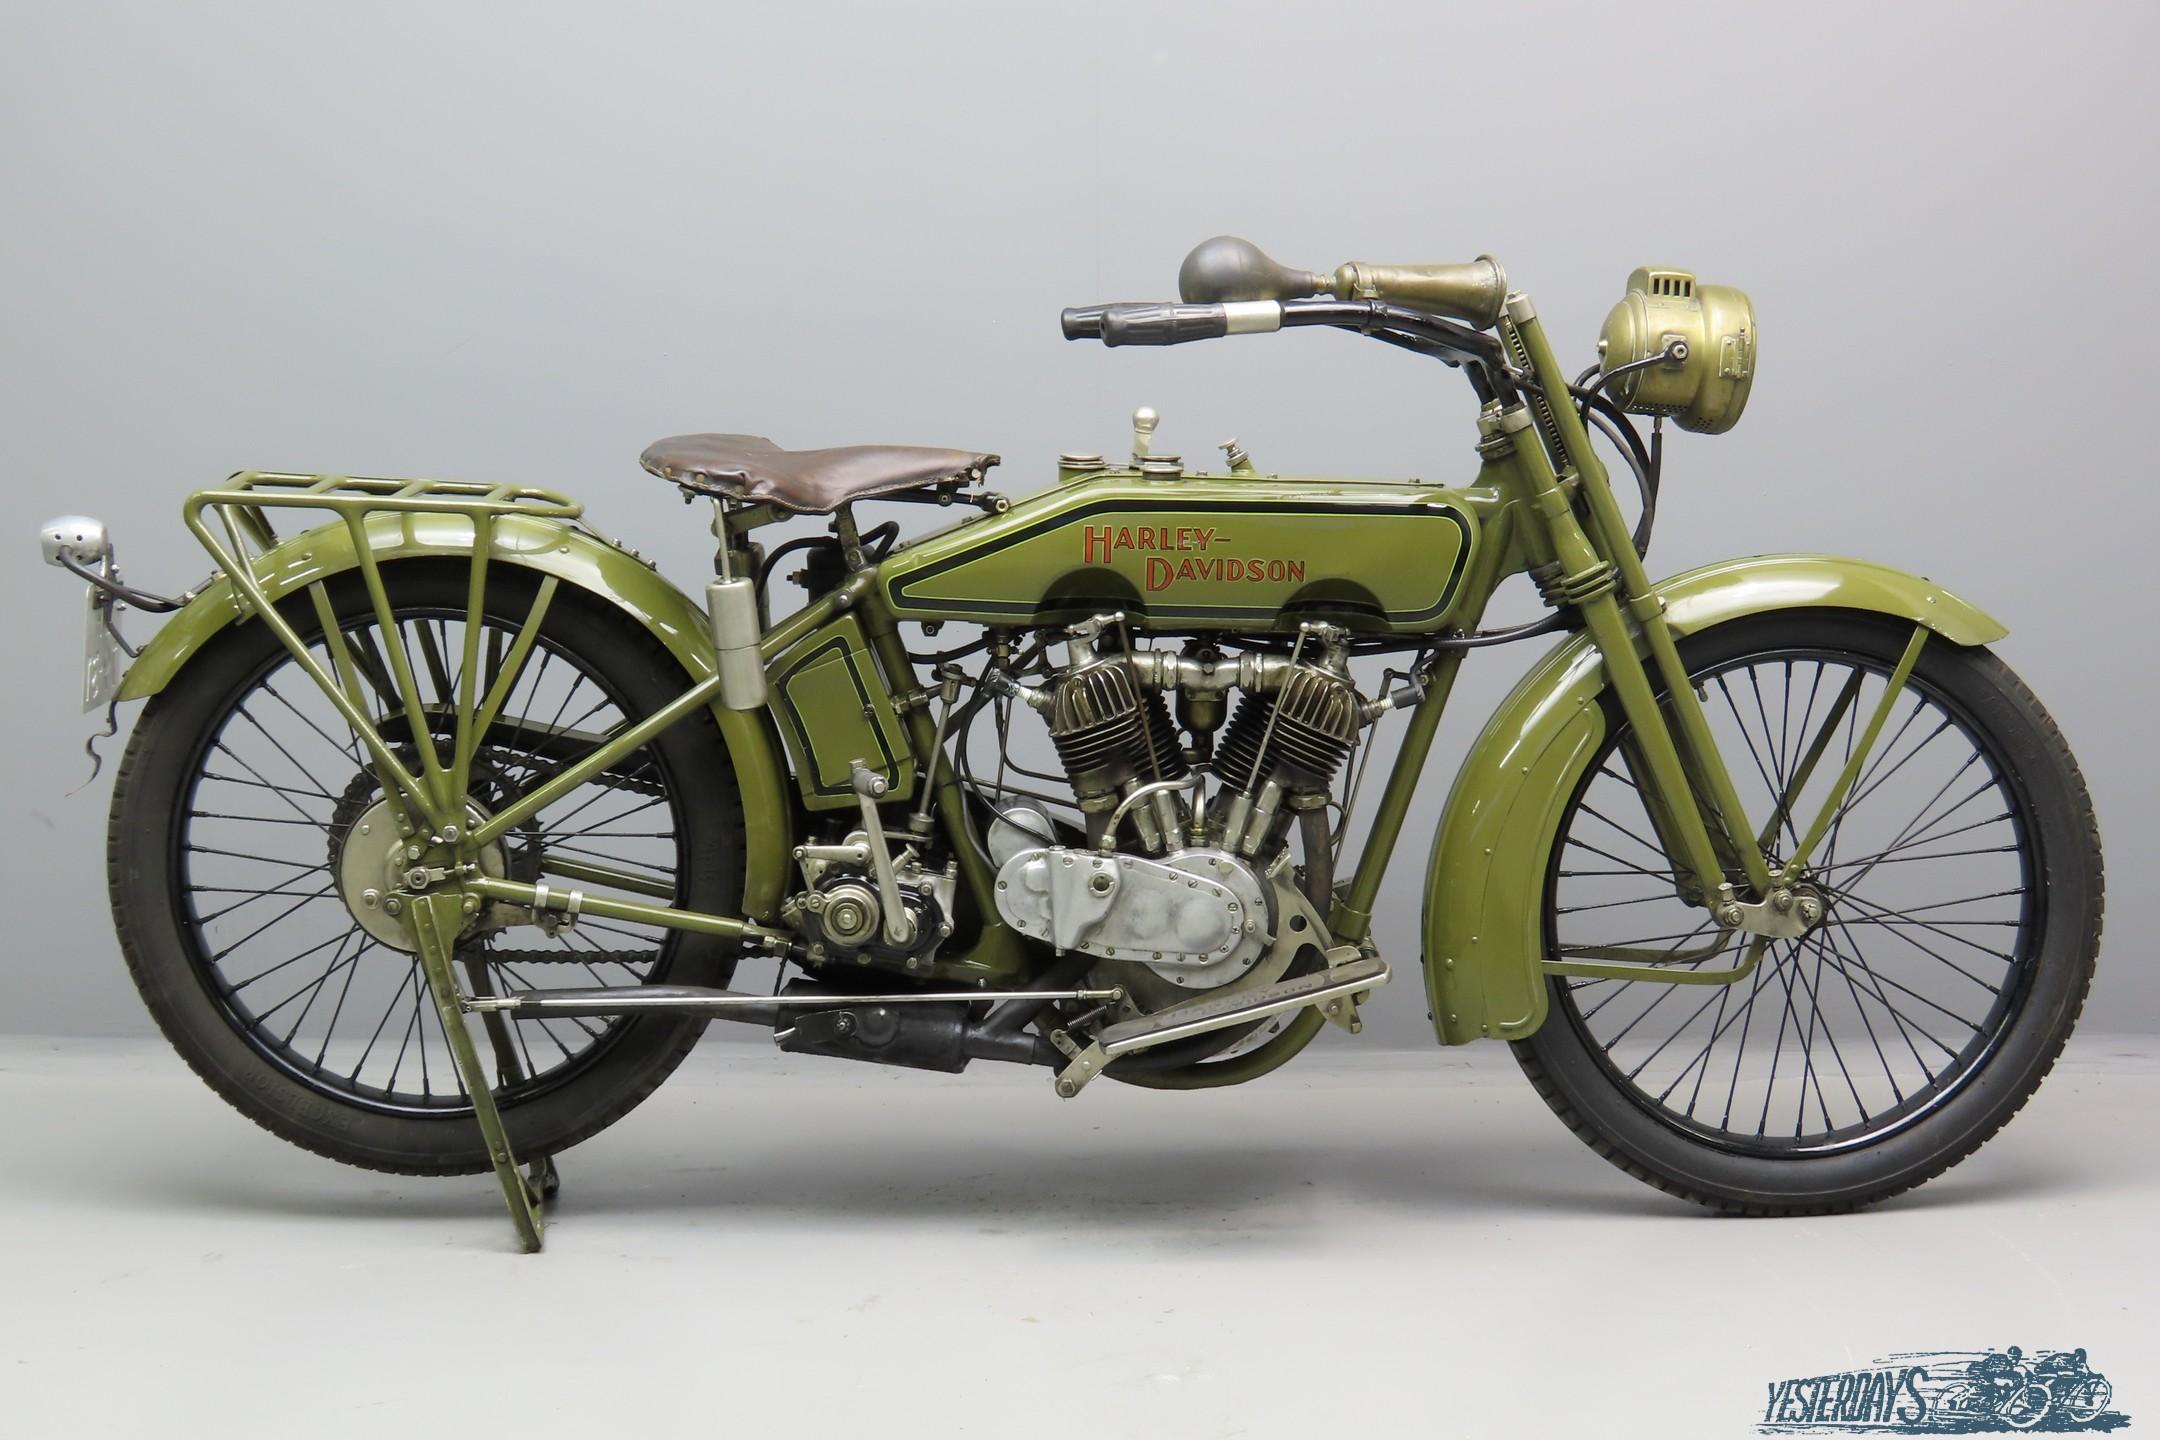 Harley Davidson 1920 989cc 2 cyl ioe 3007